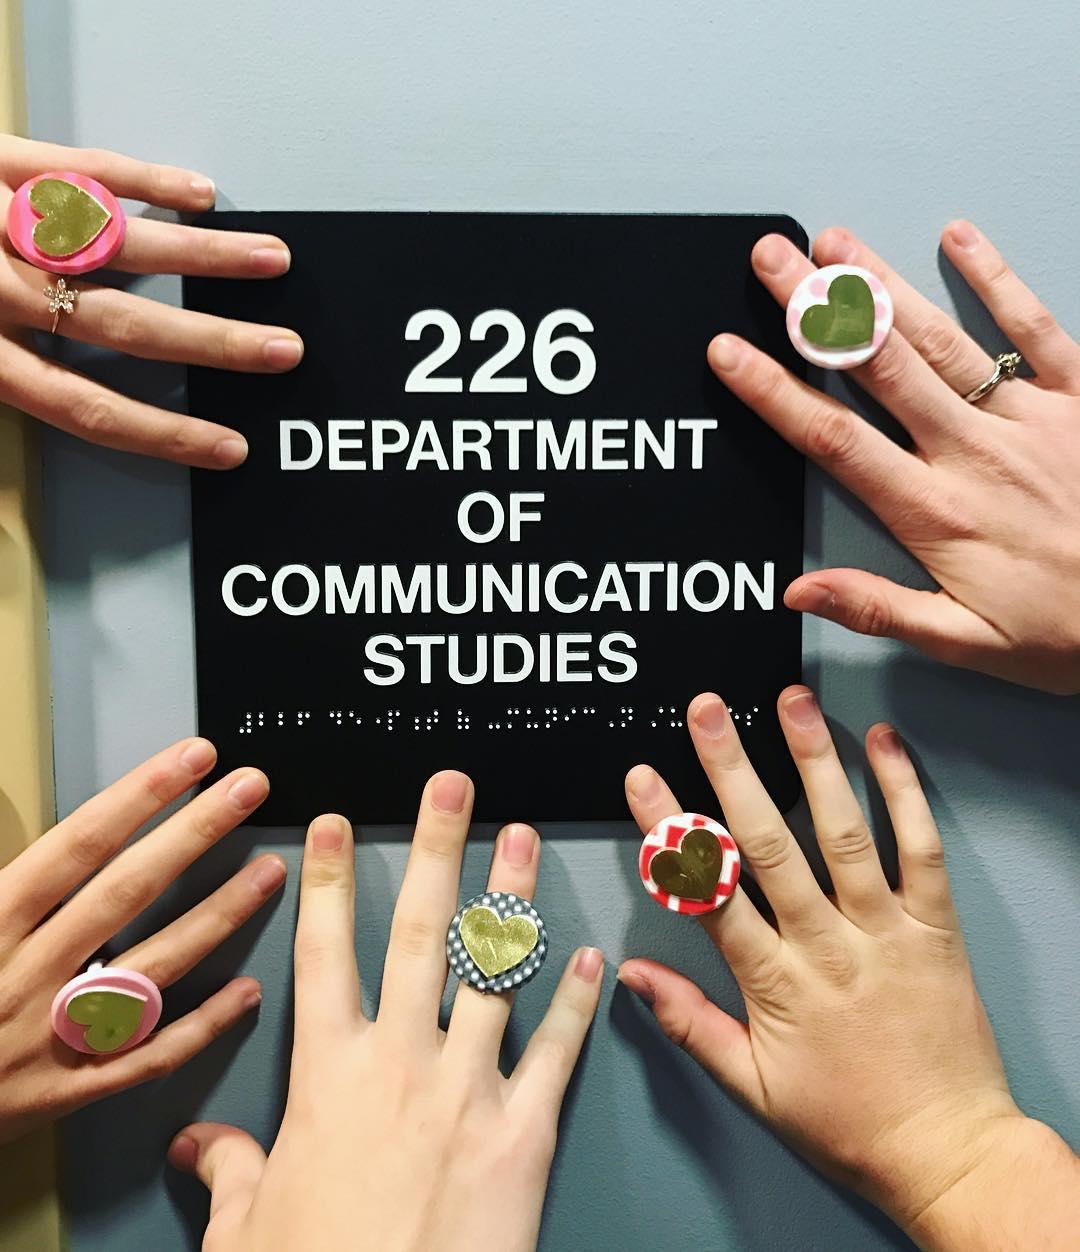 UNCW Department of Communication Studies